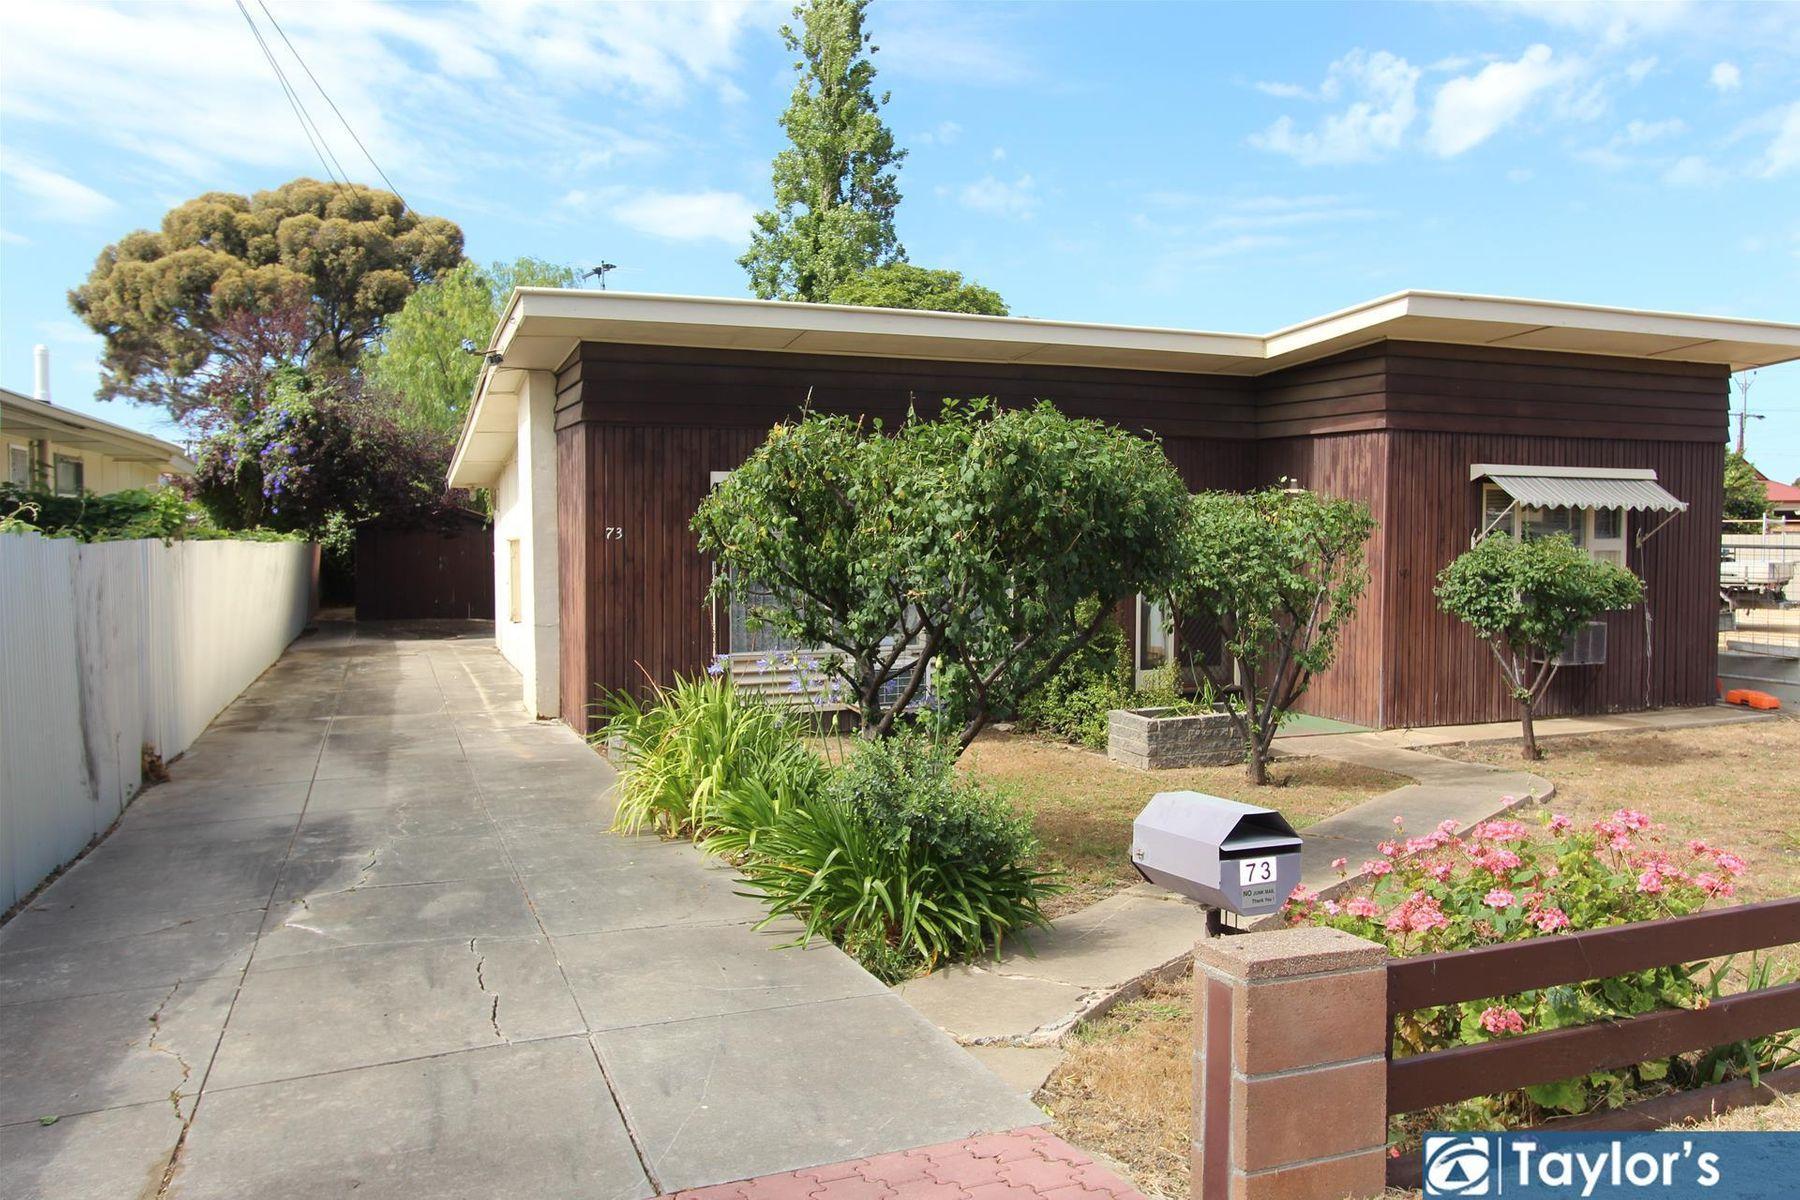 73 Lyons Road, Windsor Gardens, SA 5087